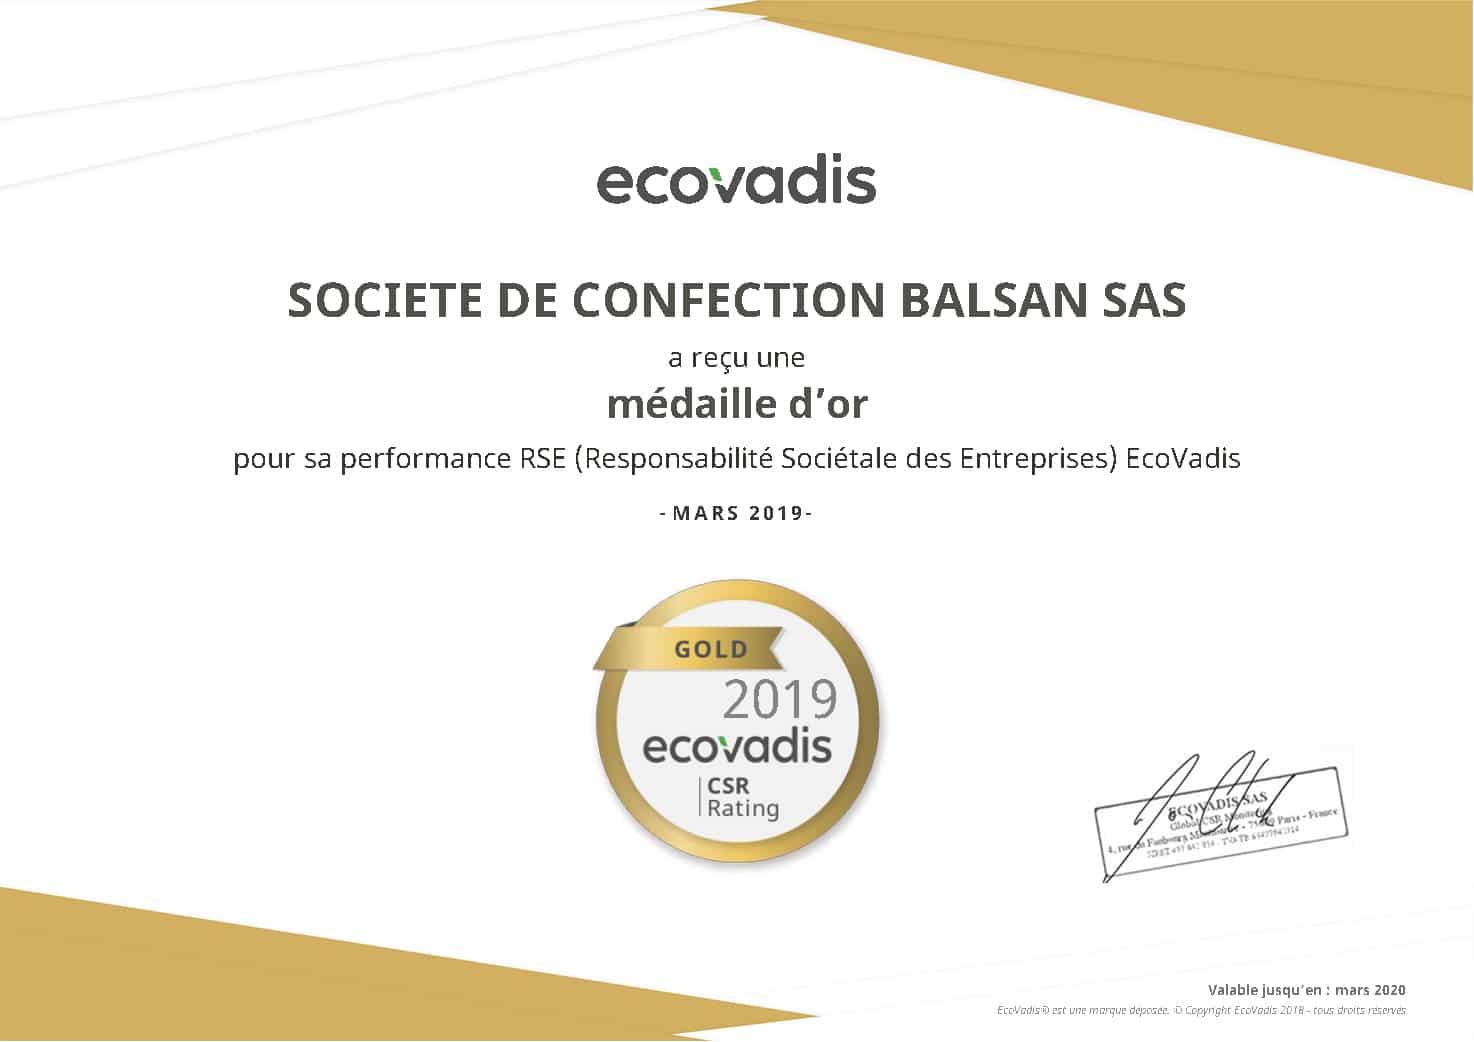 Societe de confection balsan sas ecovadis rating certificate 2019 03 26 groupe marck for Balsan recrutement